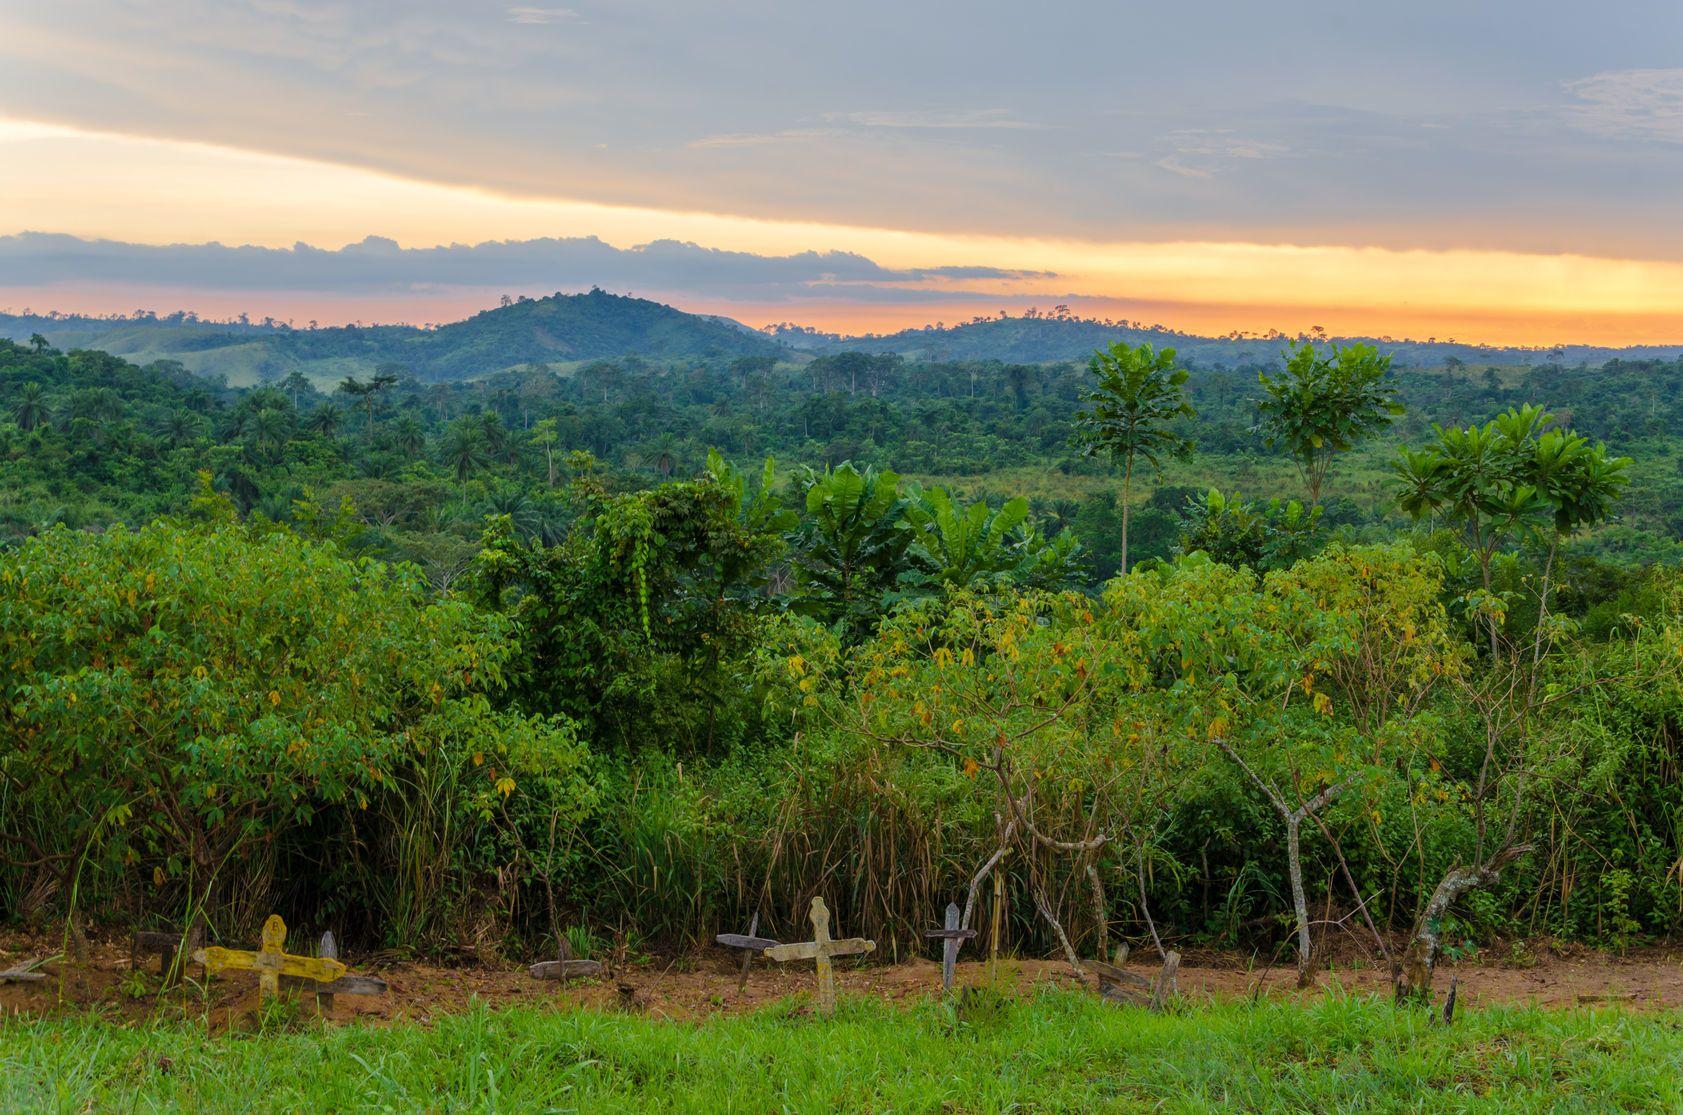 Krajina v Demokratické republice Kongo | wootan51/123RF.com